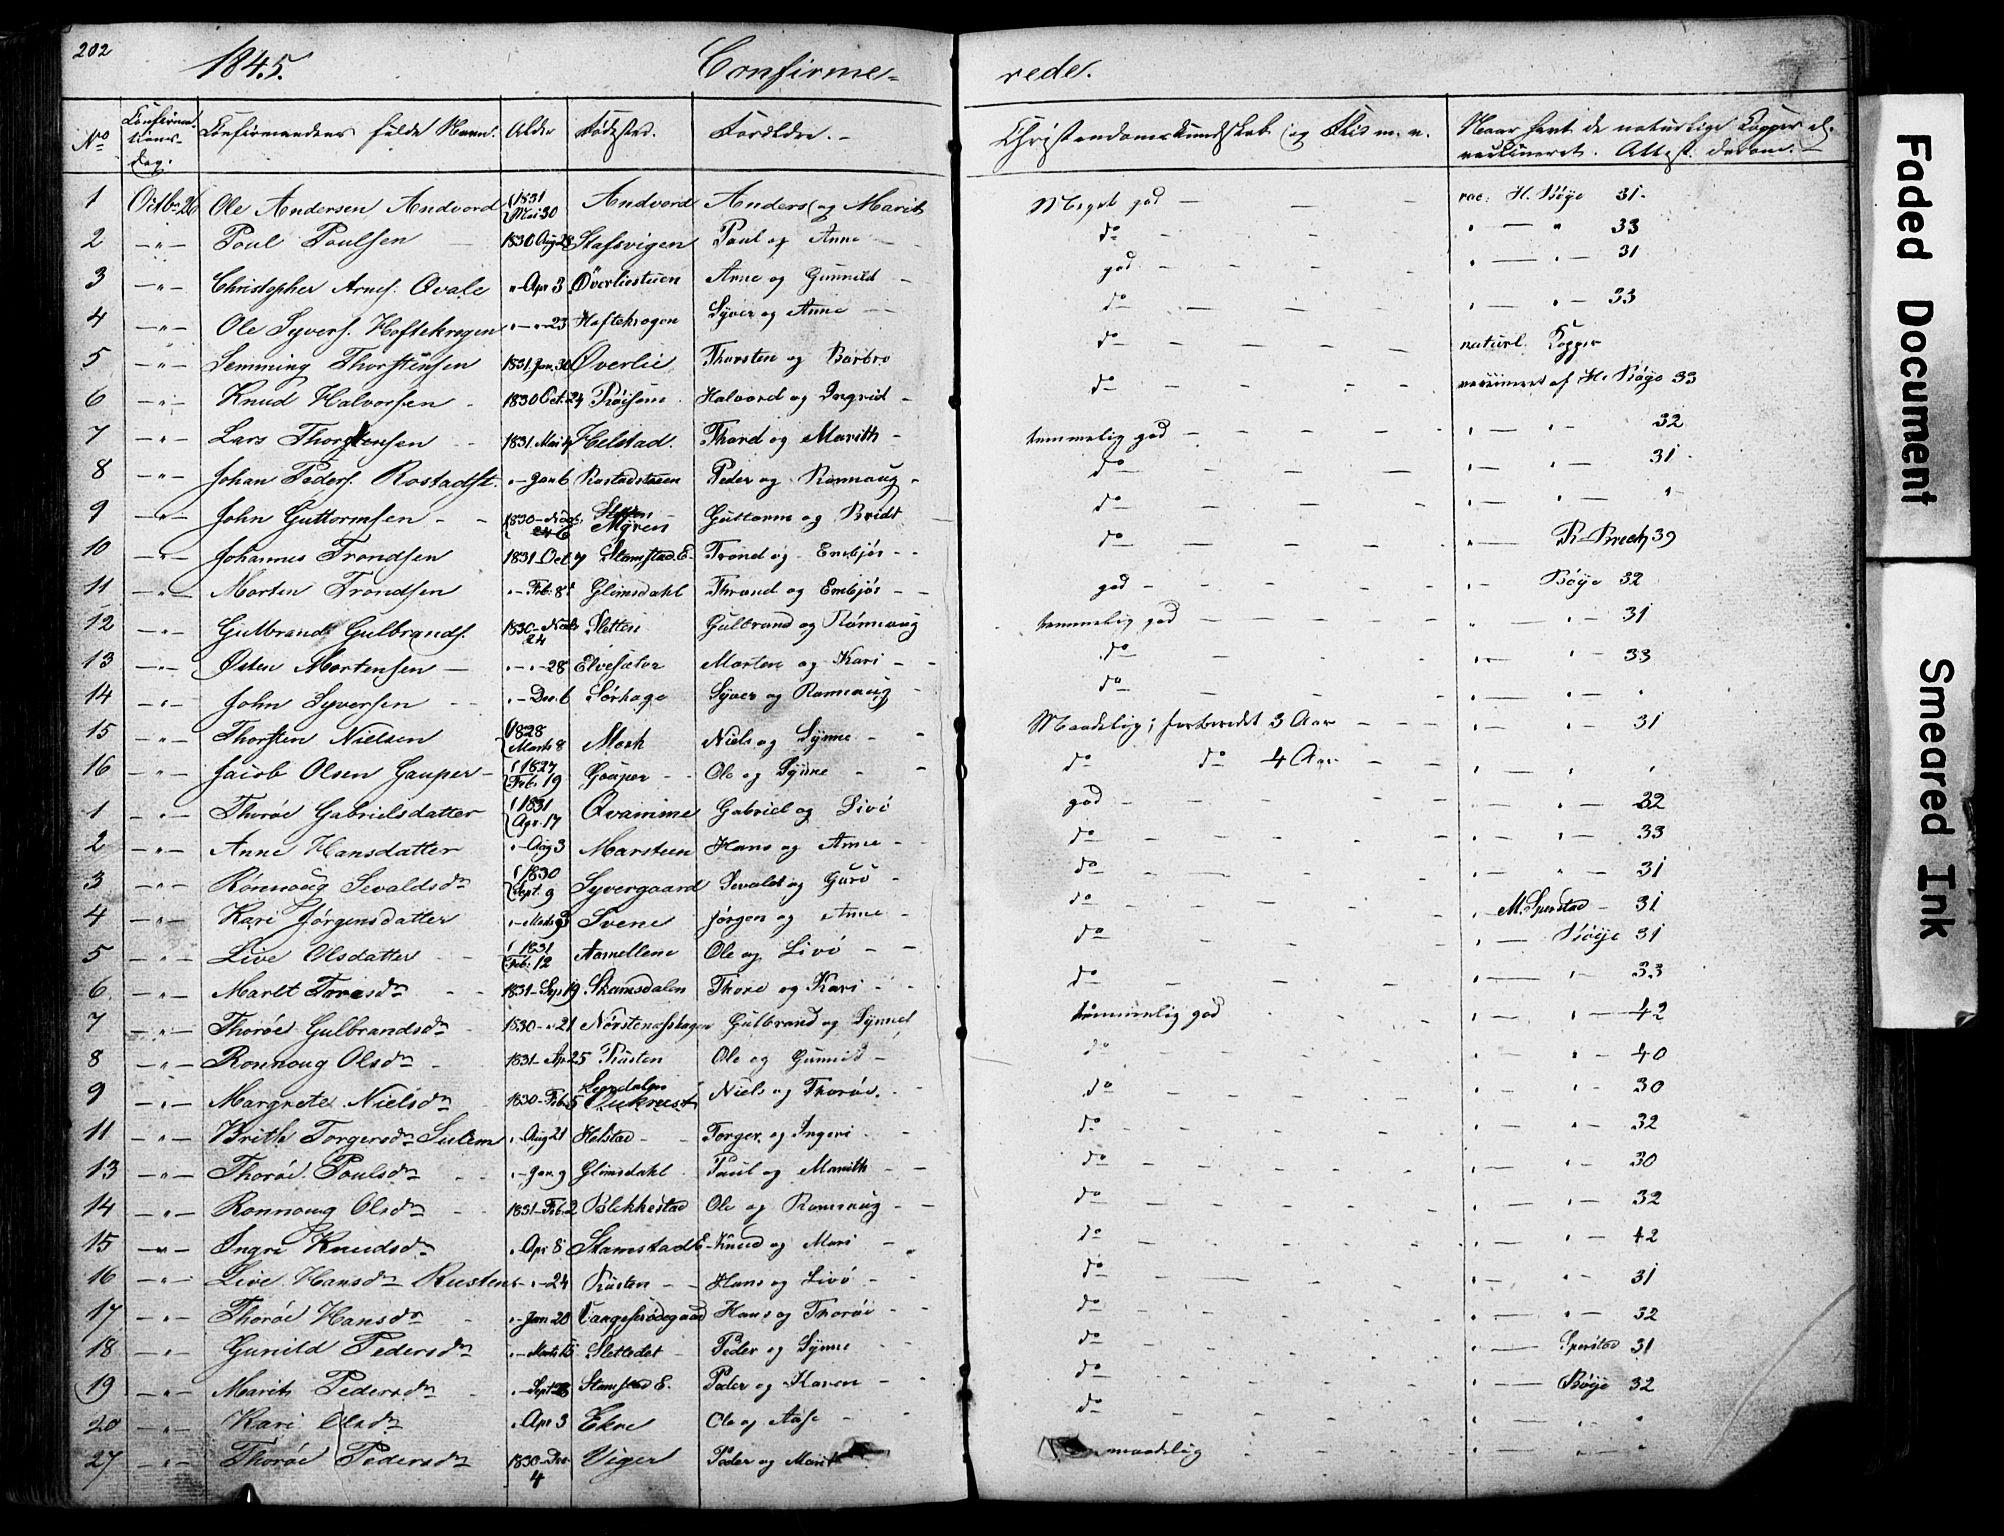 SAH, Lom prestekontor, L/L0012: Parish register (copy) no. 12, 1845-1873, p. 202-203